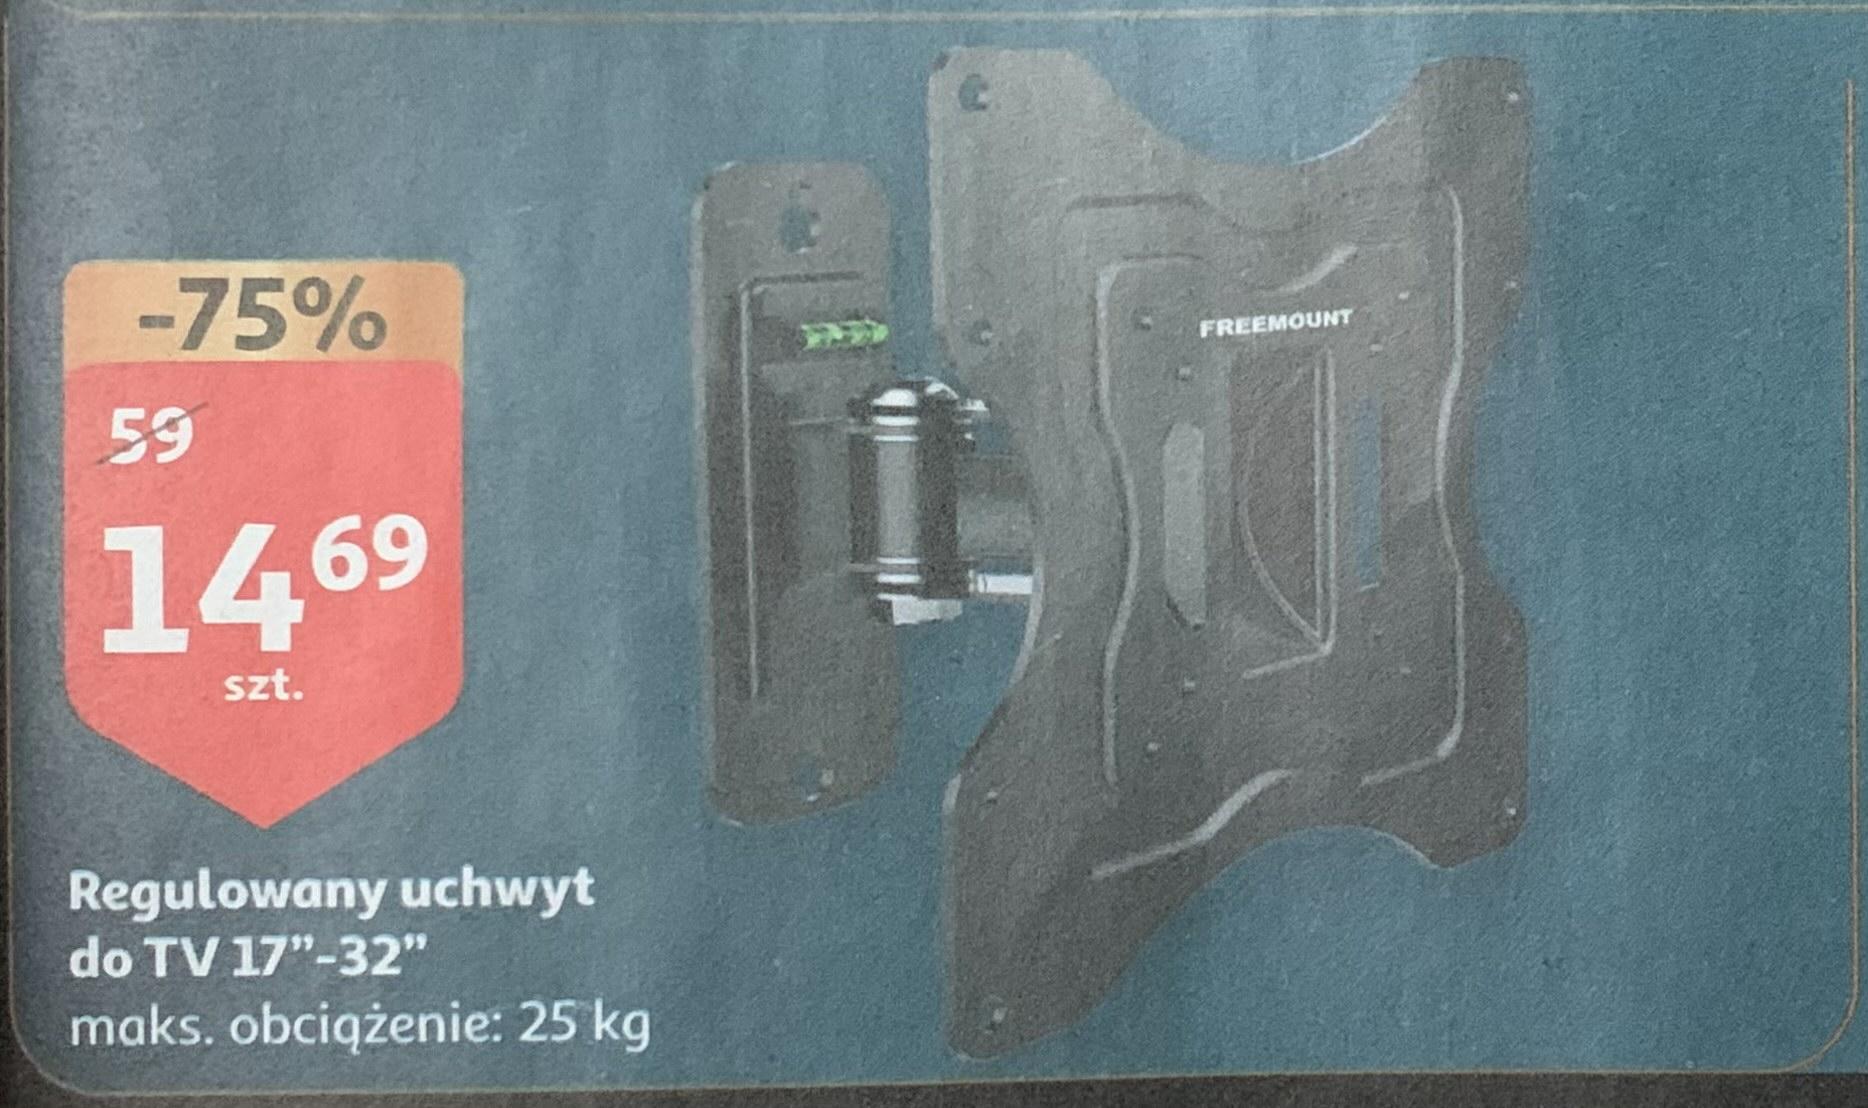 "Uchwyt regulowany do TV 17""-32"" @Auchan"